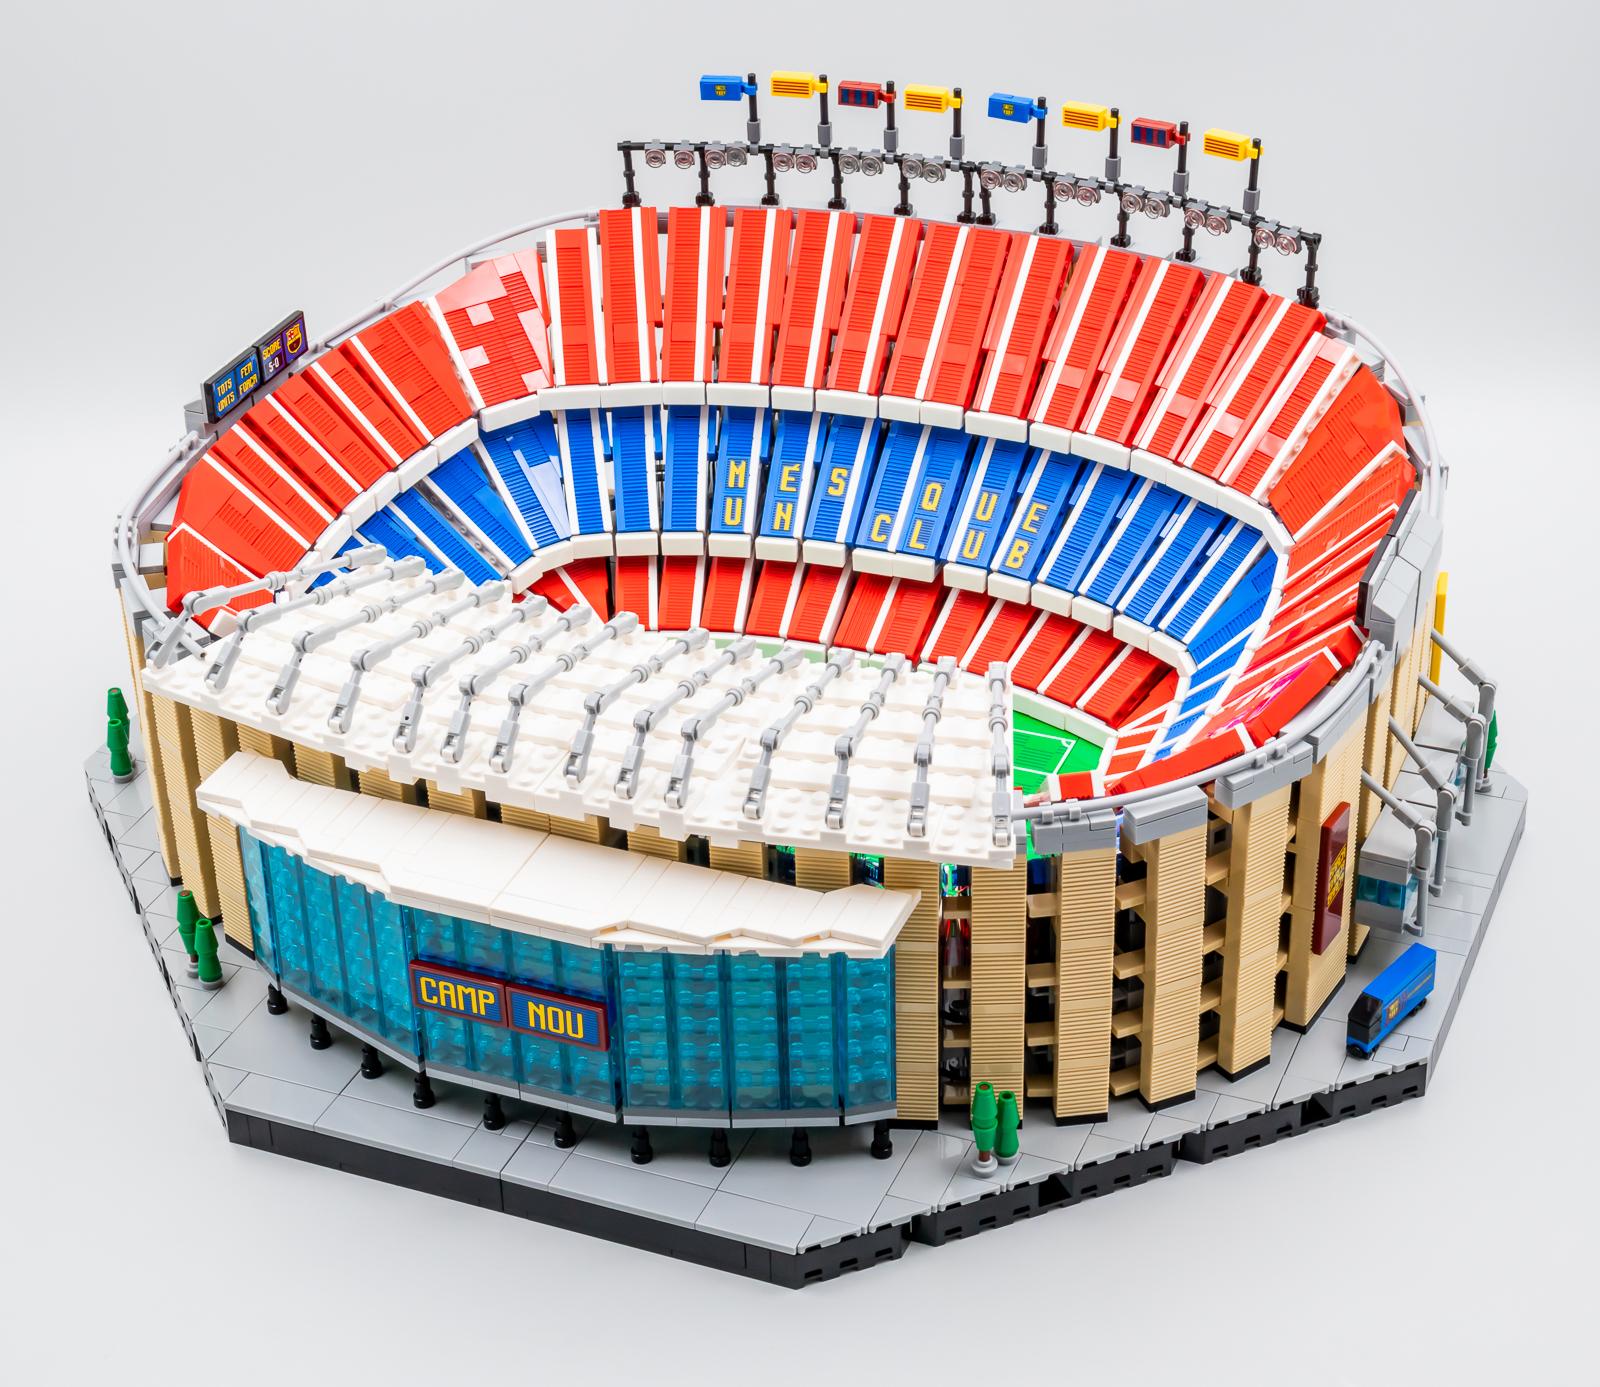 LEGO : Ze topik =) - Page 8 10284-lego-fc-barcelona-camp-nou-stadium_26